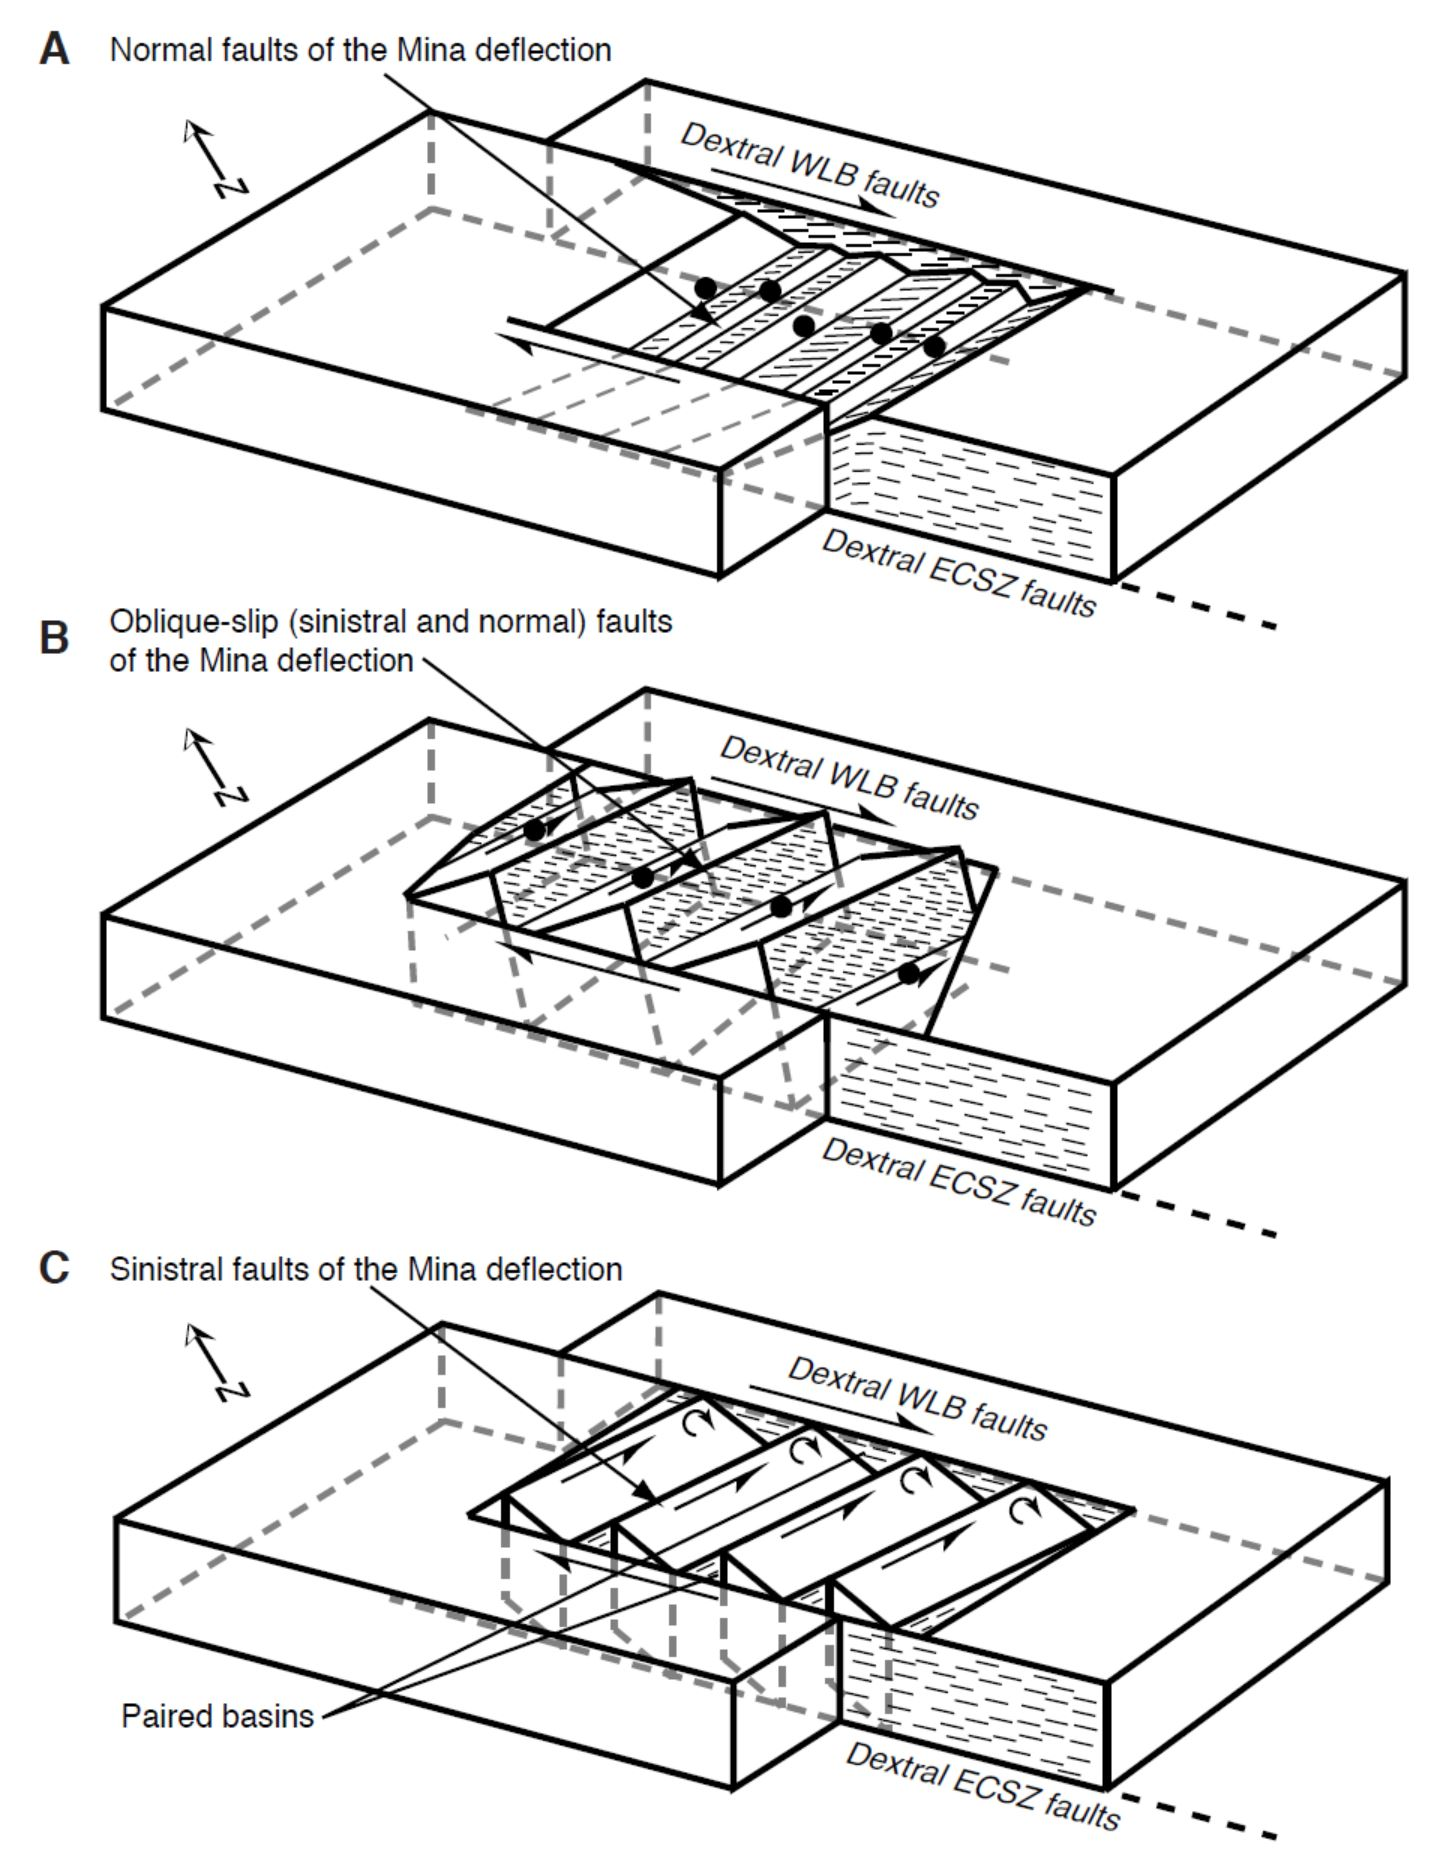 strike slip fault block diagram 2000 pontiac grand am engine earthquake report nevada jay patton online